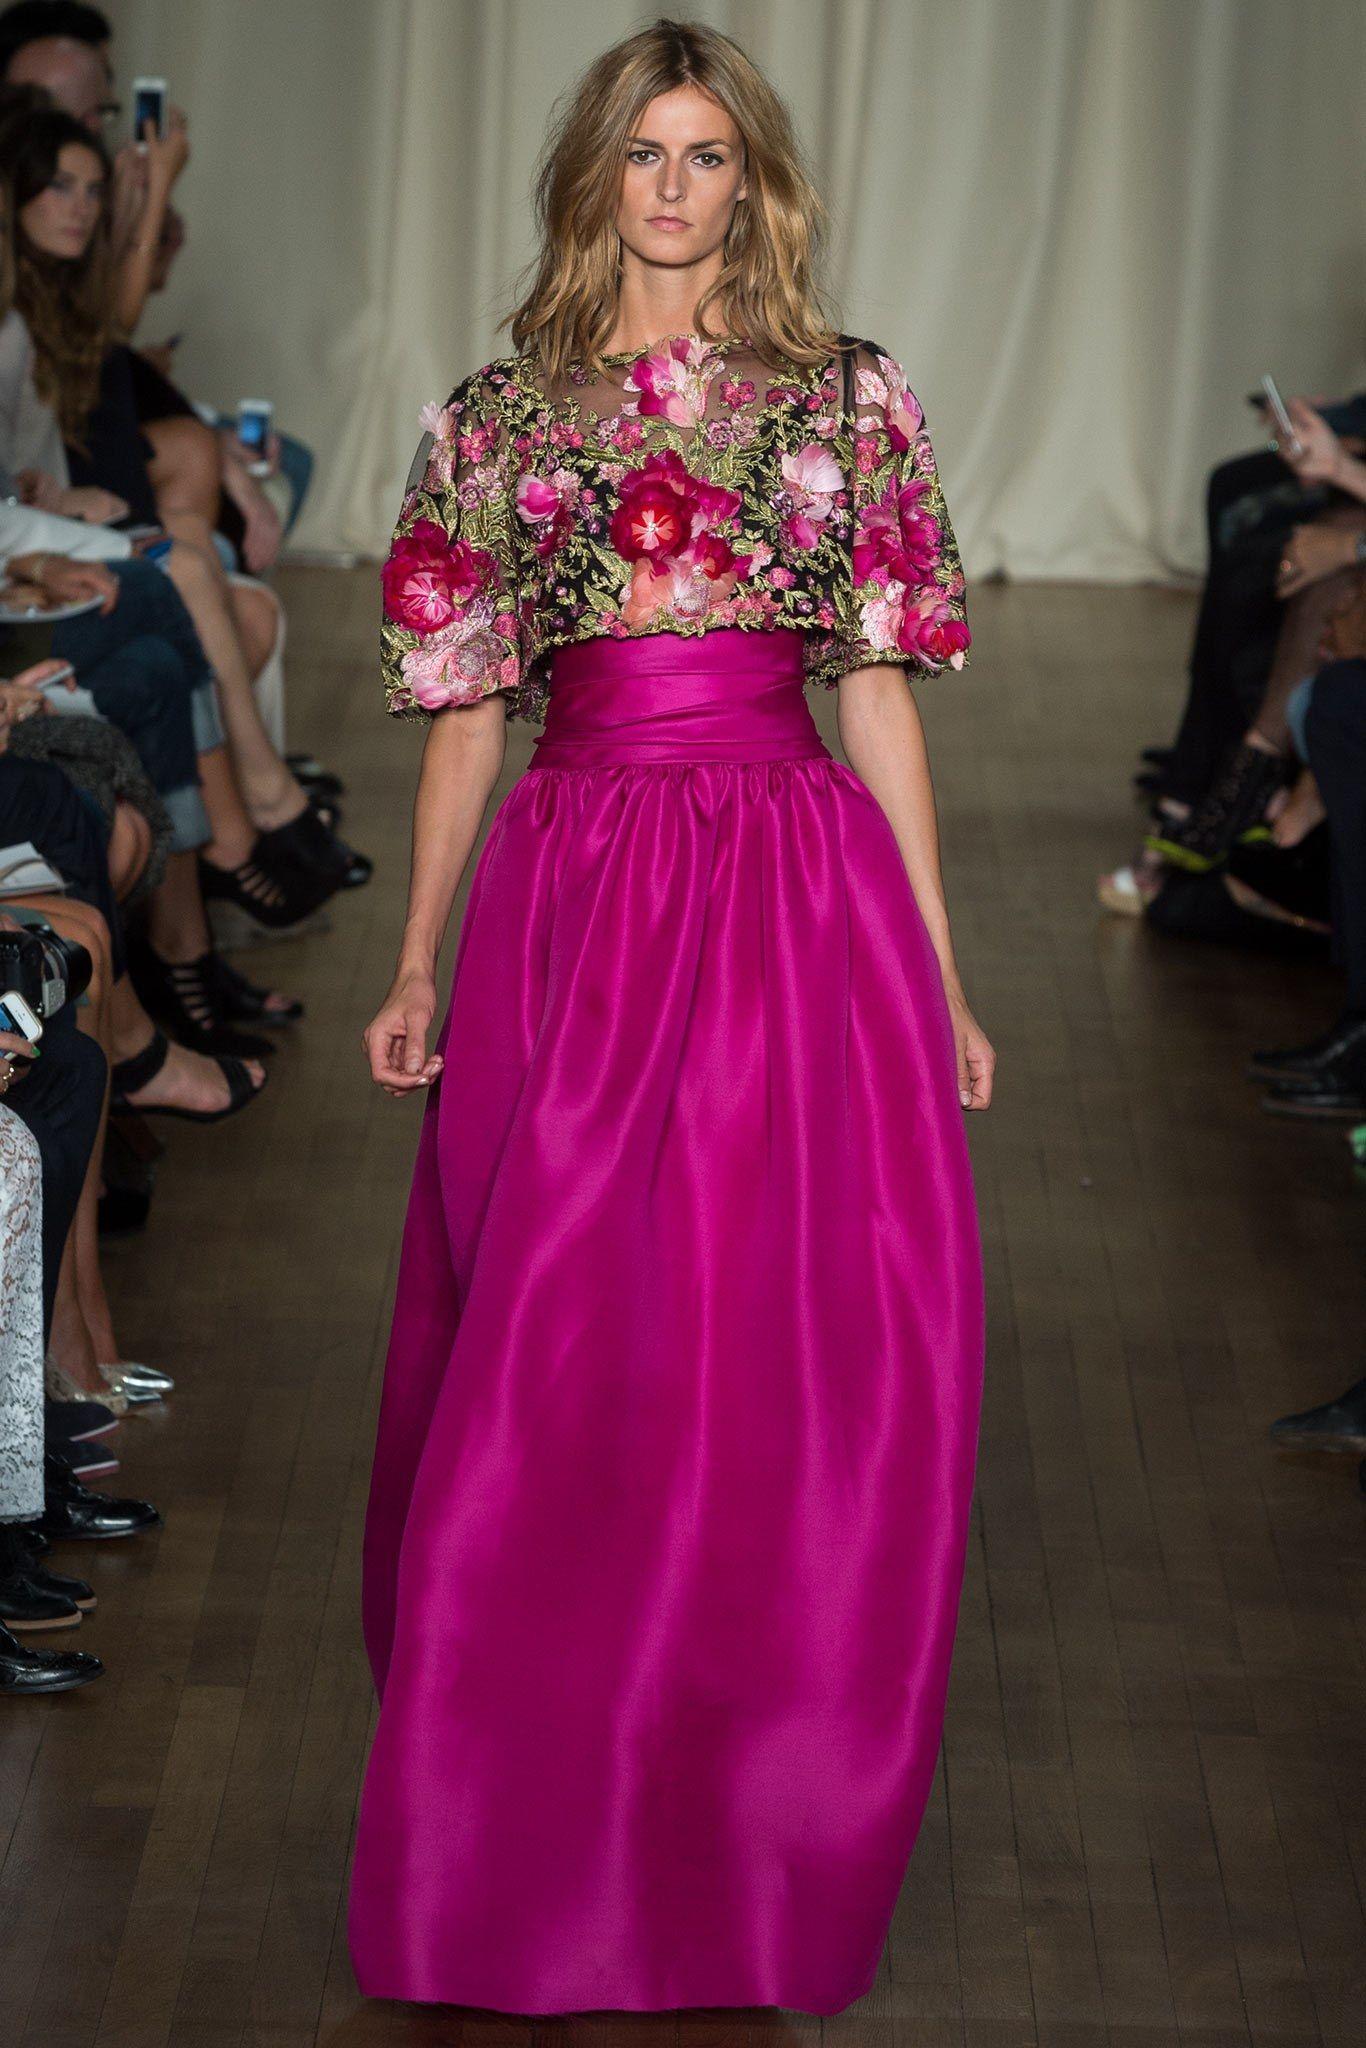 Marchesa Spring 2015 Ready-to-Wear Fashion Show | La invitada y Perfecta